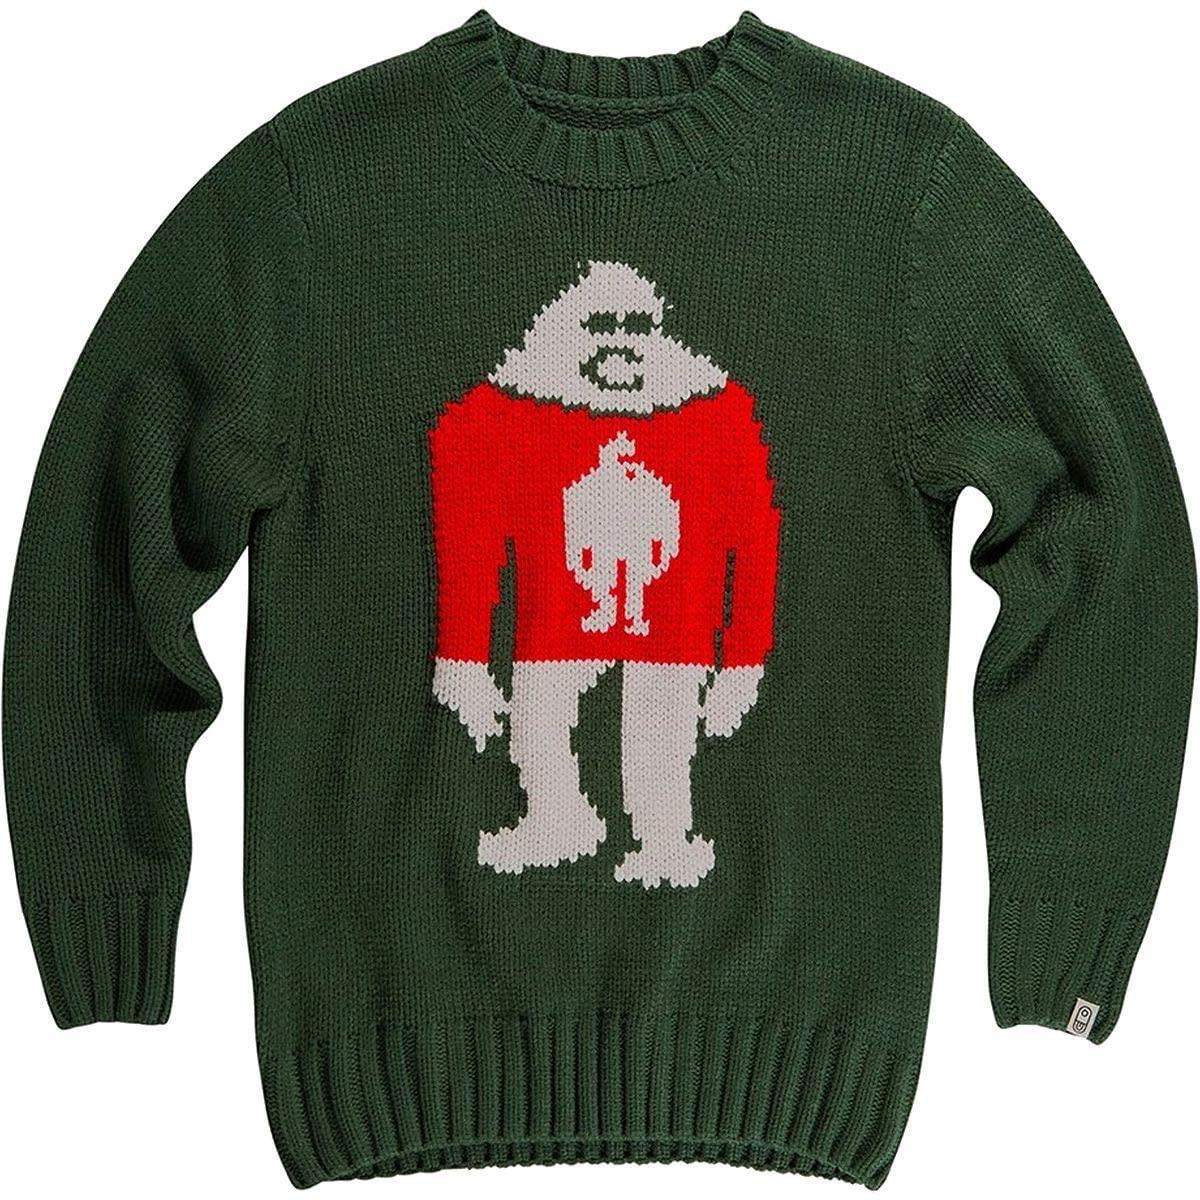 AIRBLASTER Unisex-Adult Sassy Sasquatch Big Foot Holiday Sweater